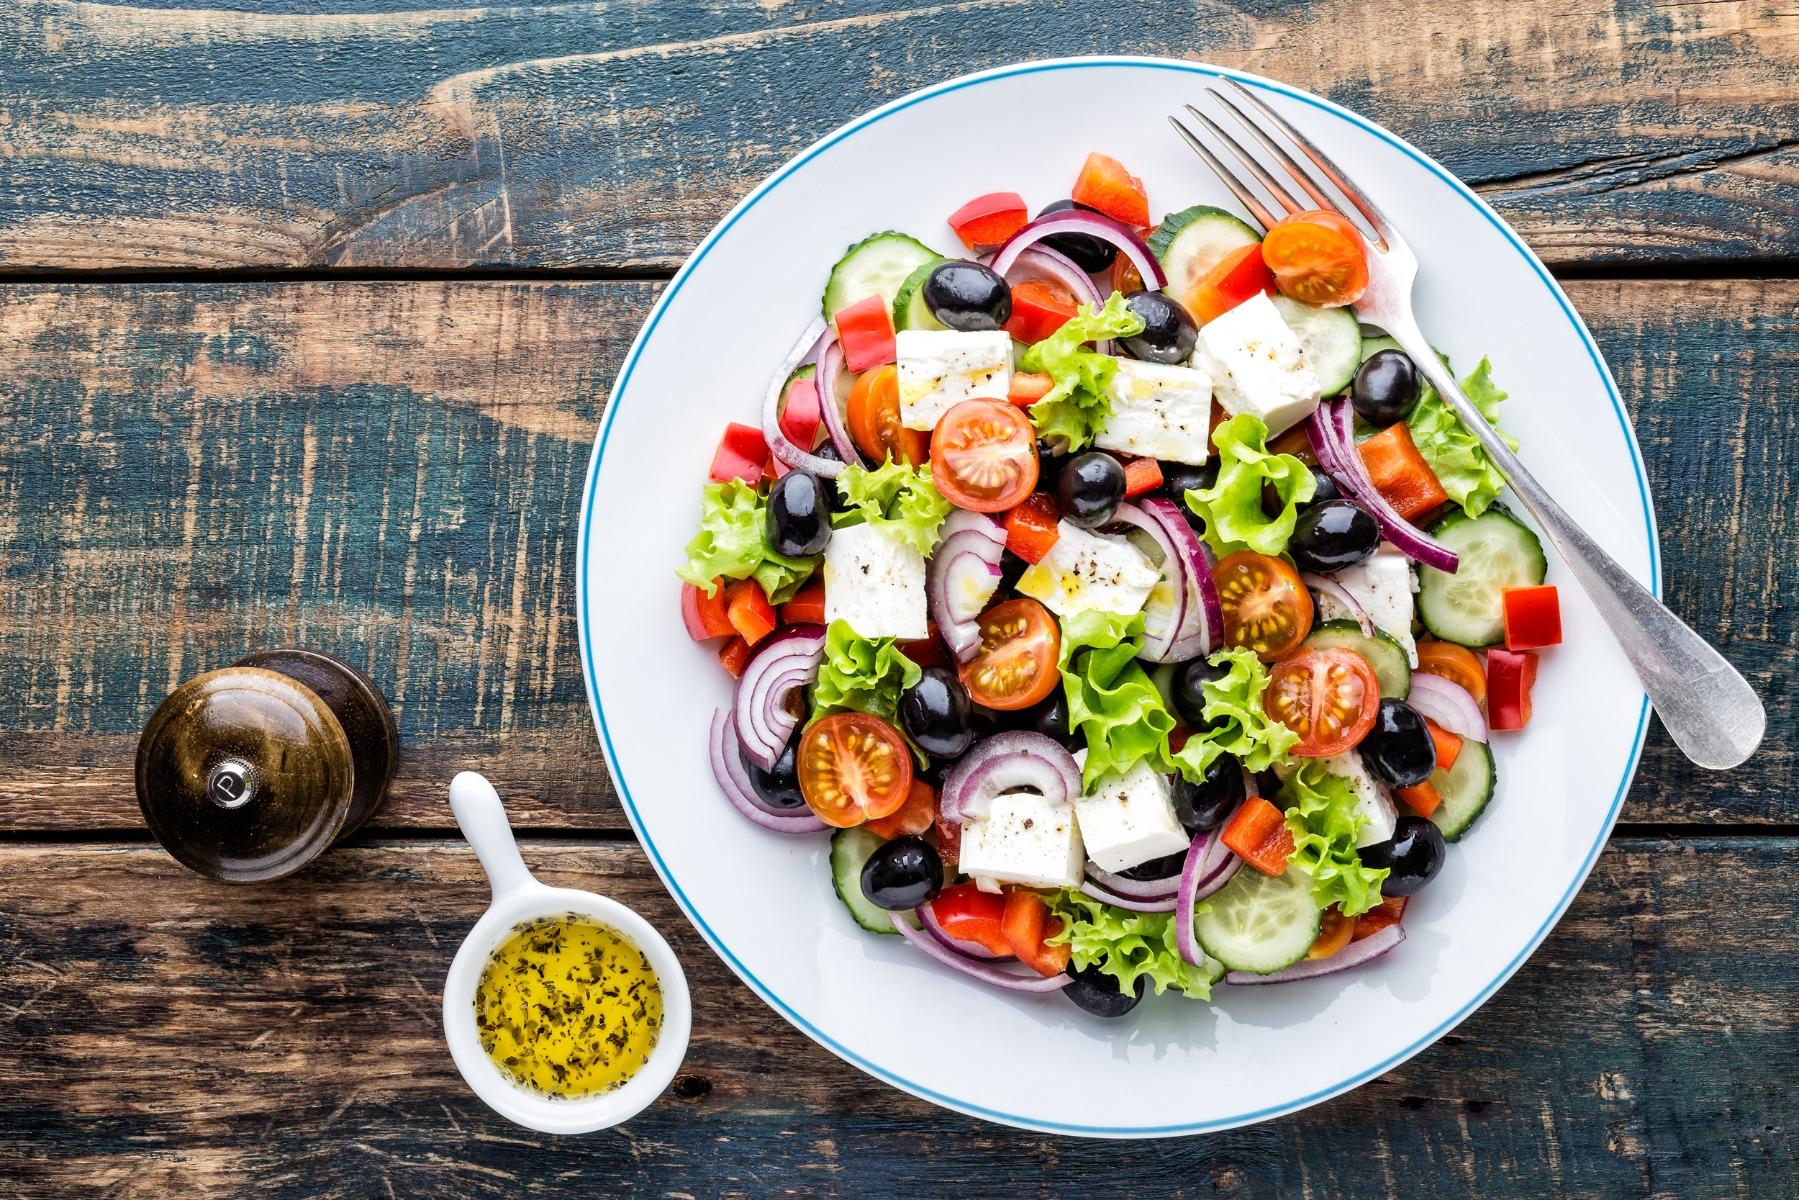 PrikenTik - wijnstreken - foodpairing - griekse salade